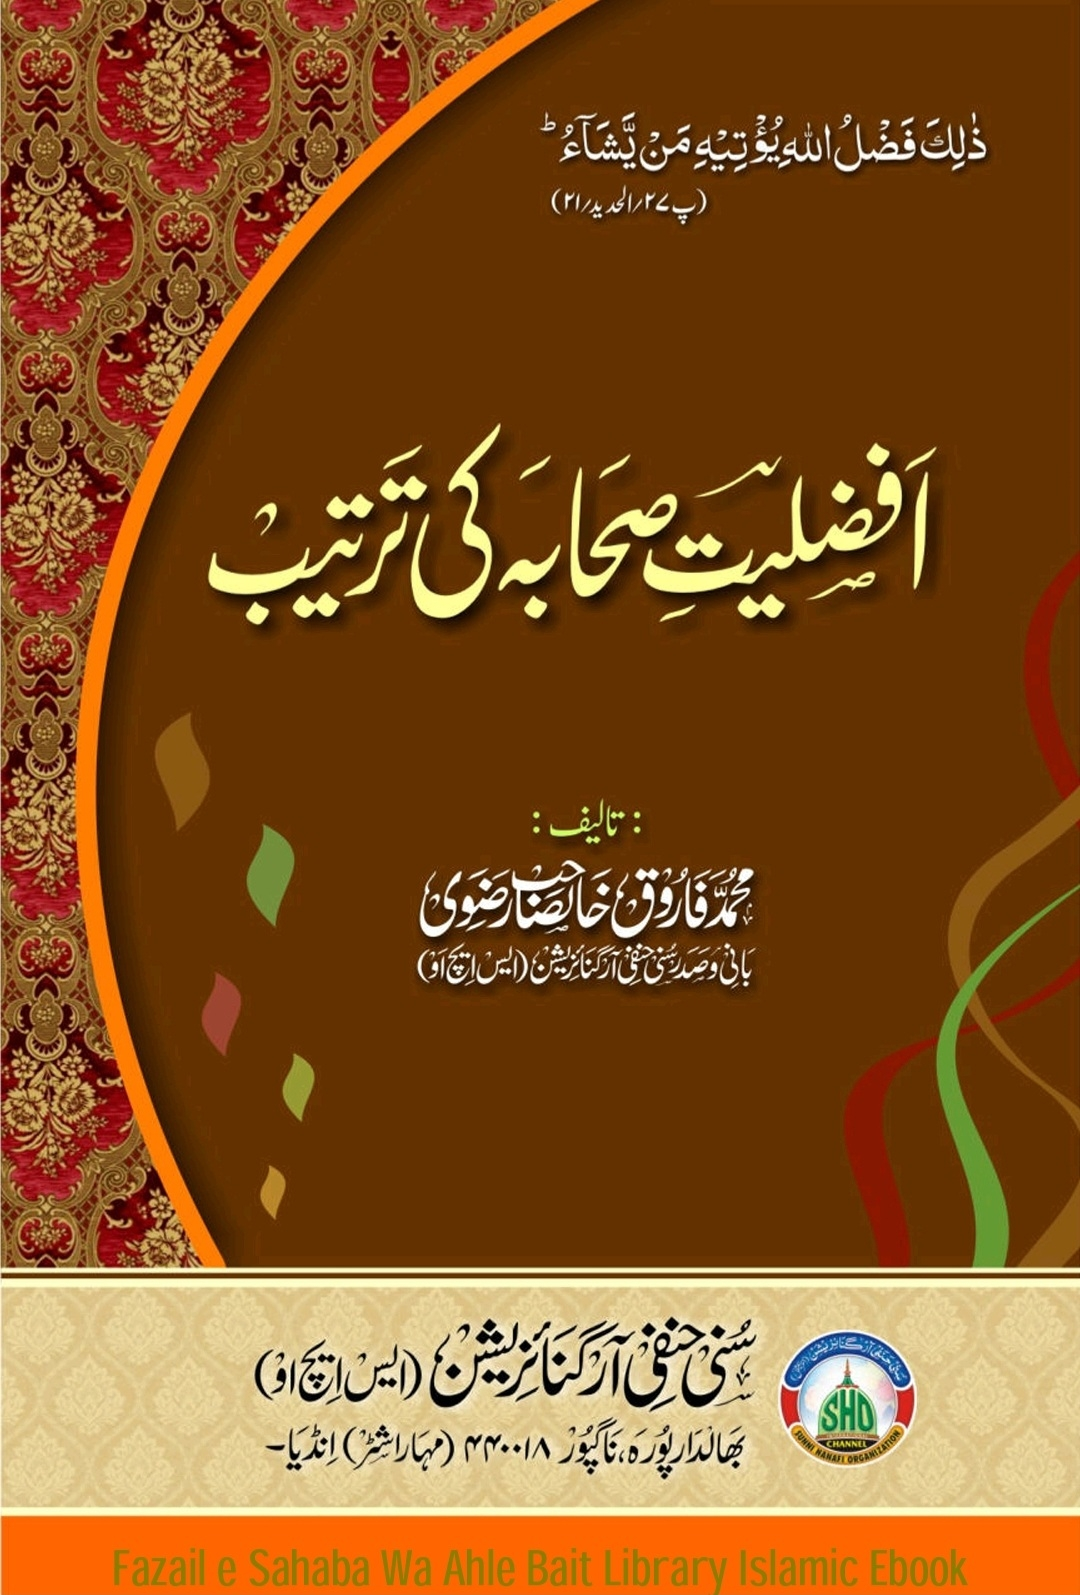 Afzaliyat E Sahaba Ki Tarteeb / افضلیت صحابہ کی ترتیبby مولانا محمد فاروق خان صاحب رضوی